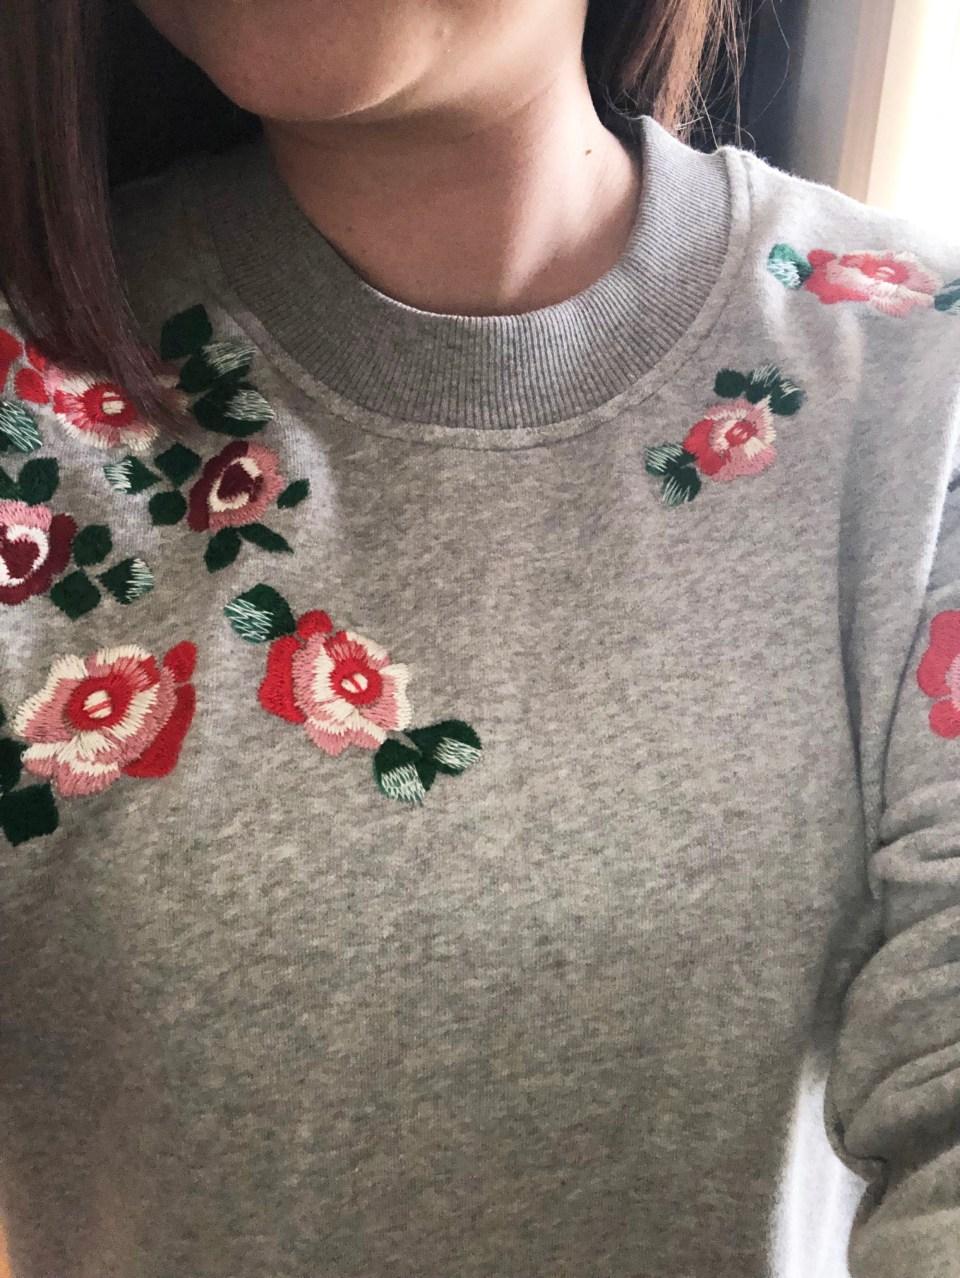 Floral Embroidered Sweatshirt 14